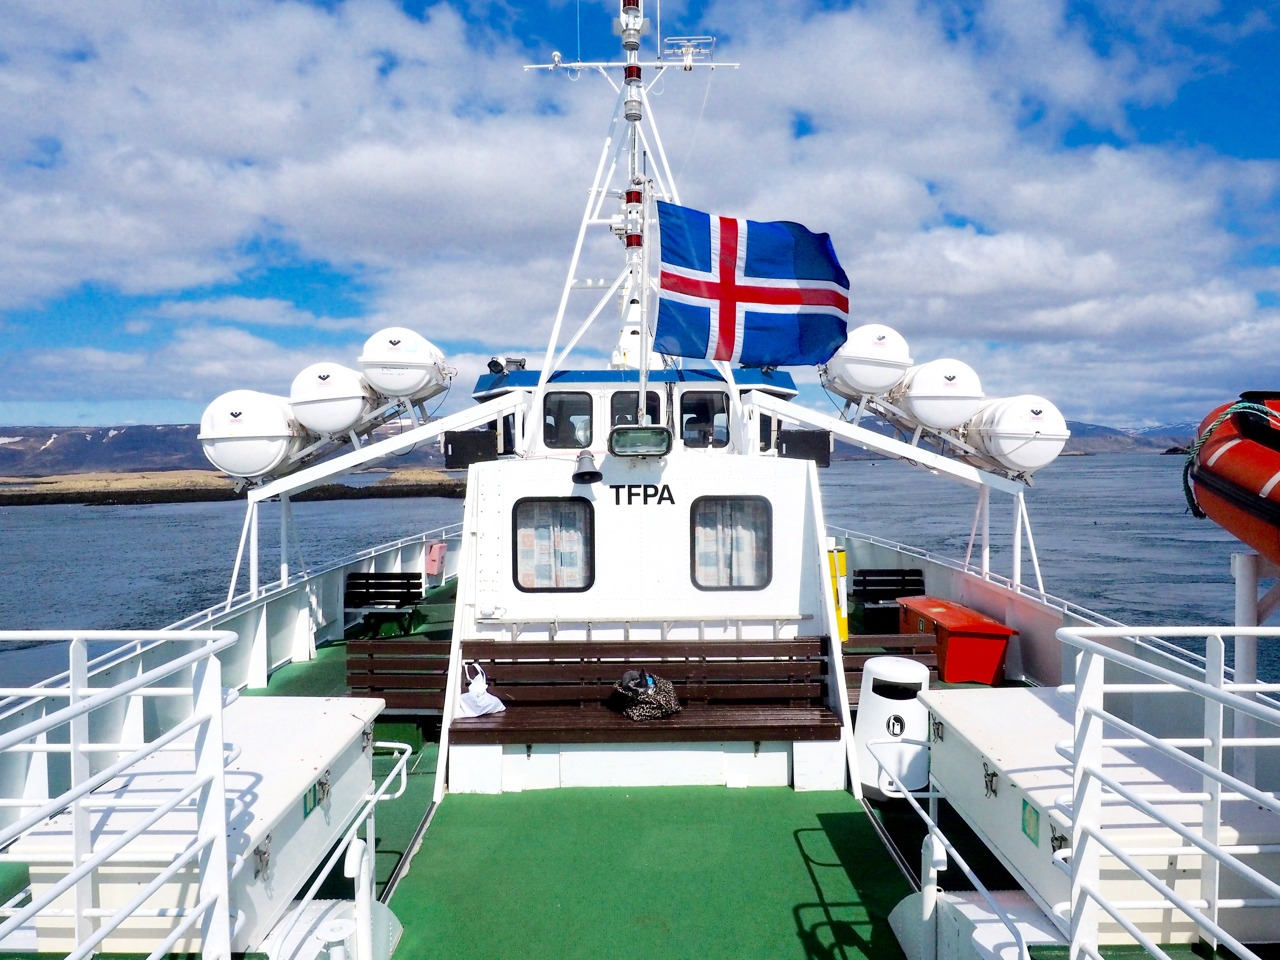 Snaefellsness Peninsula, Stykkishólmur boat trip - The Best Day Trips from Reykjavik